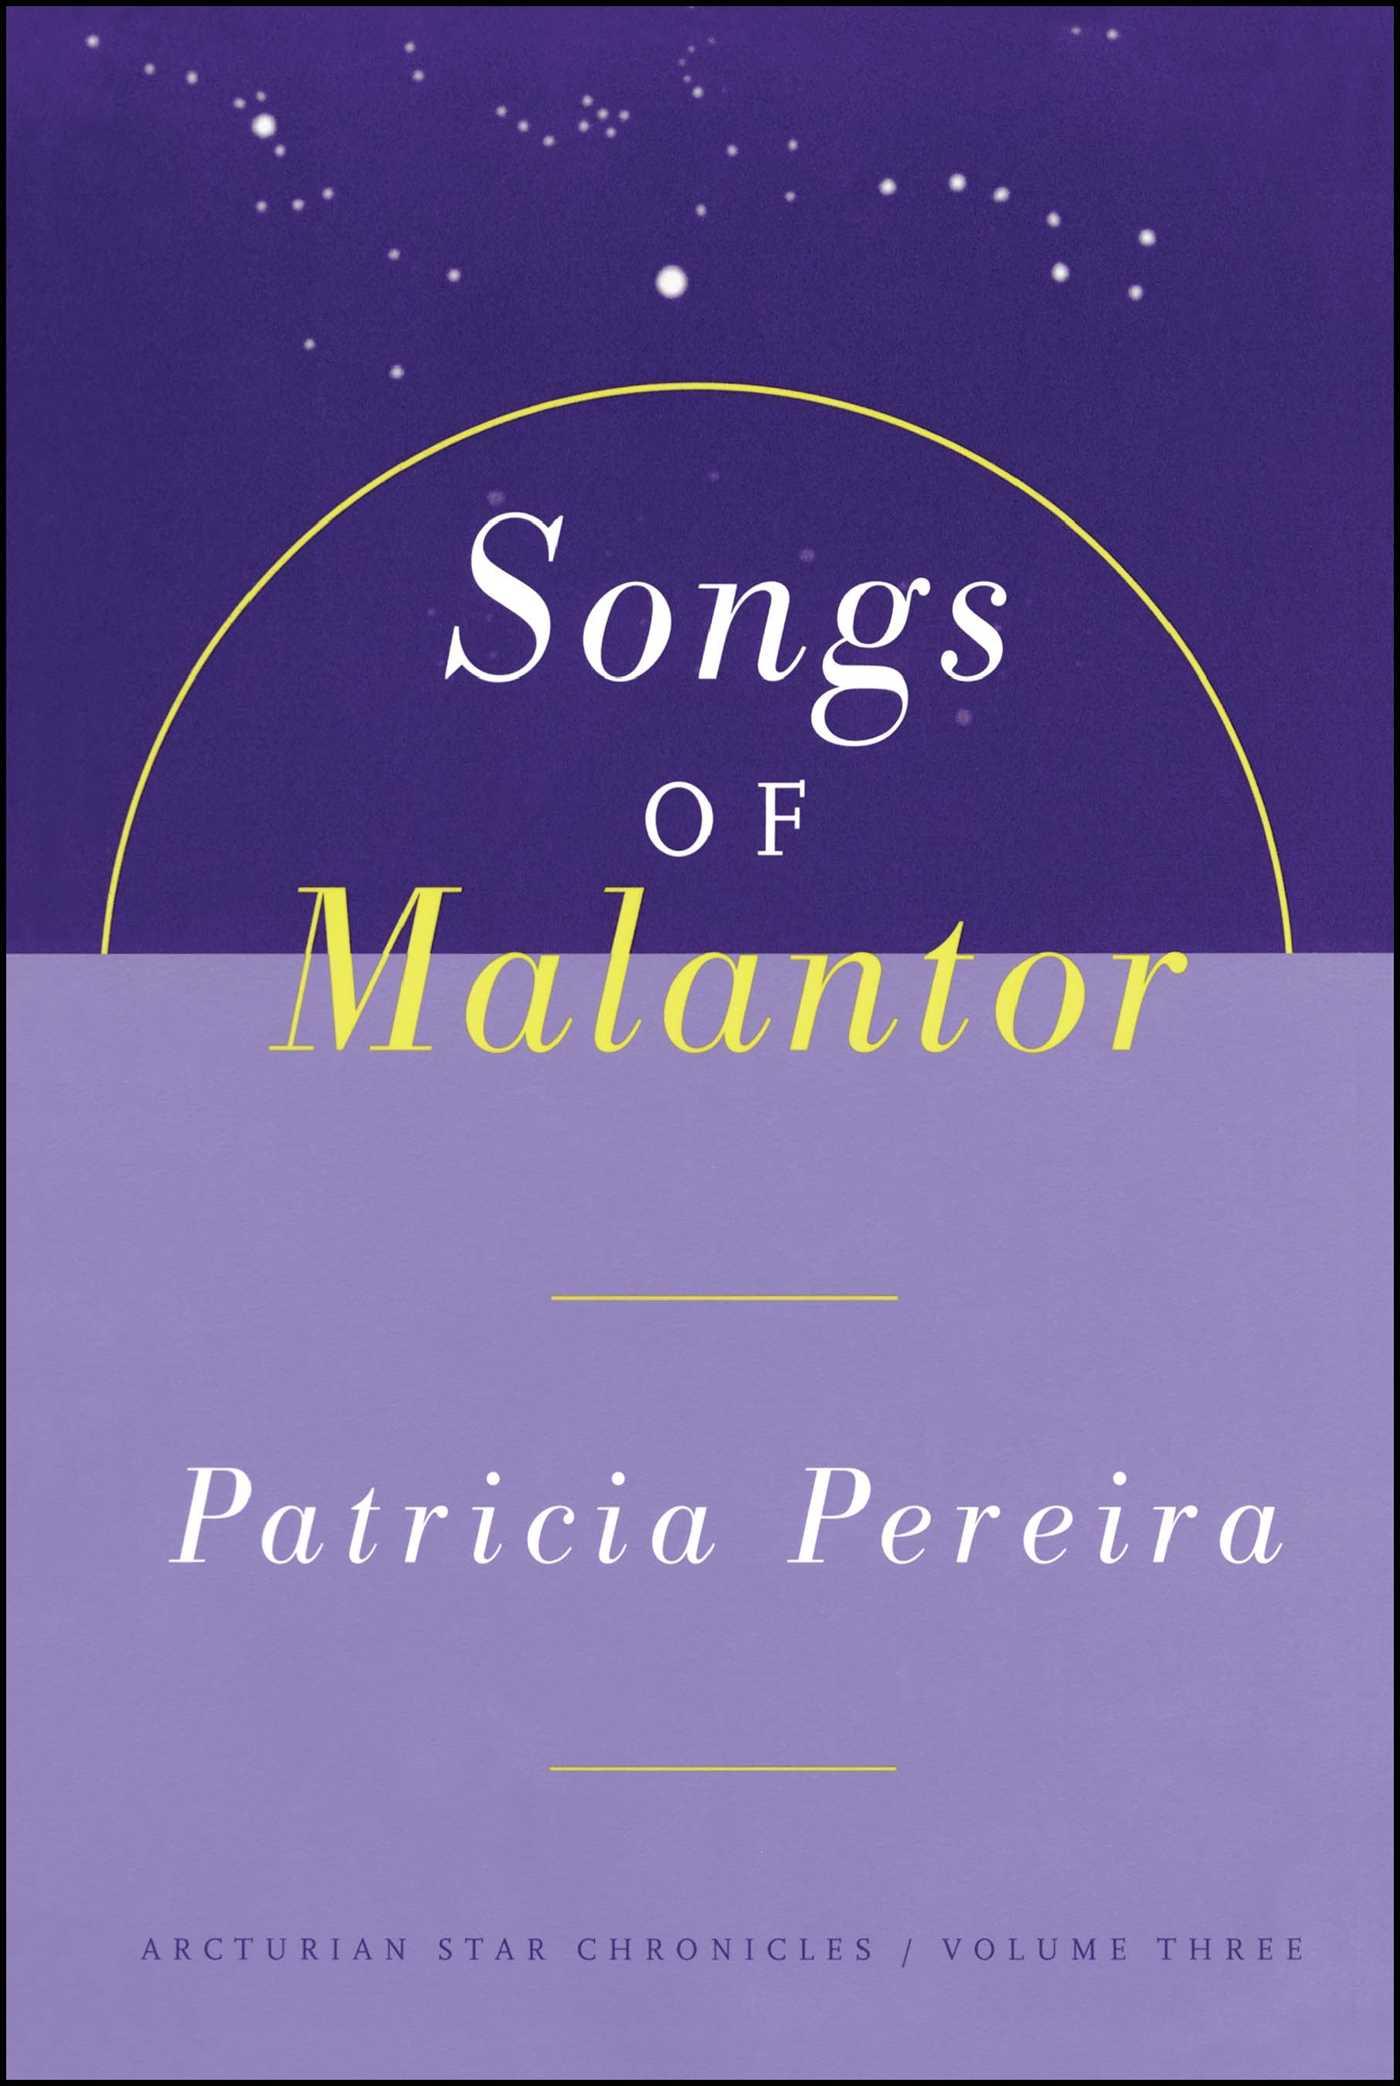 Songs of malantor 9781885223708 hr